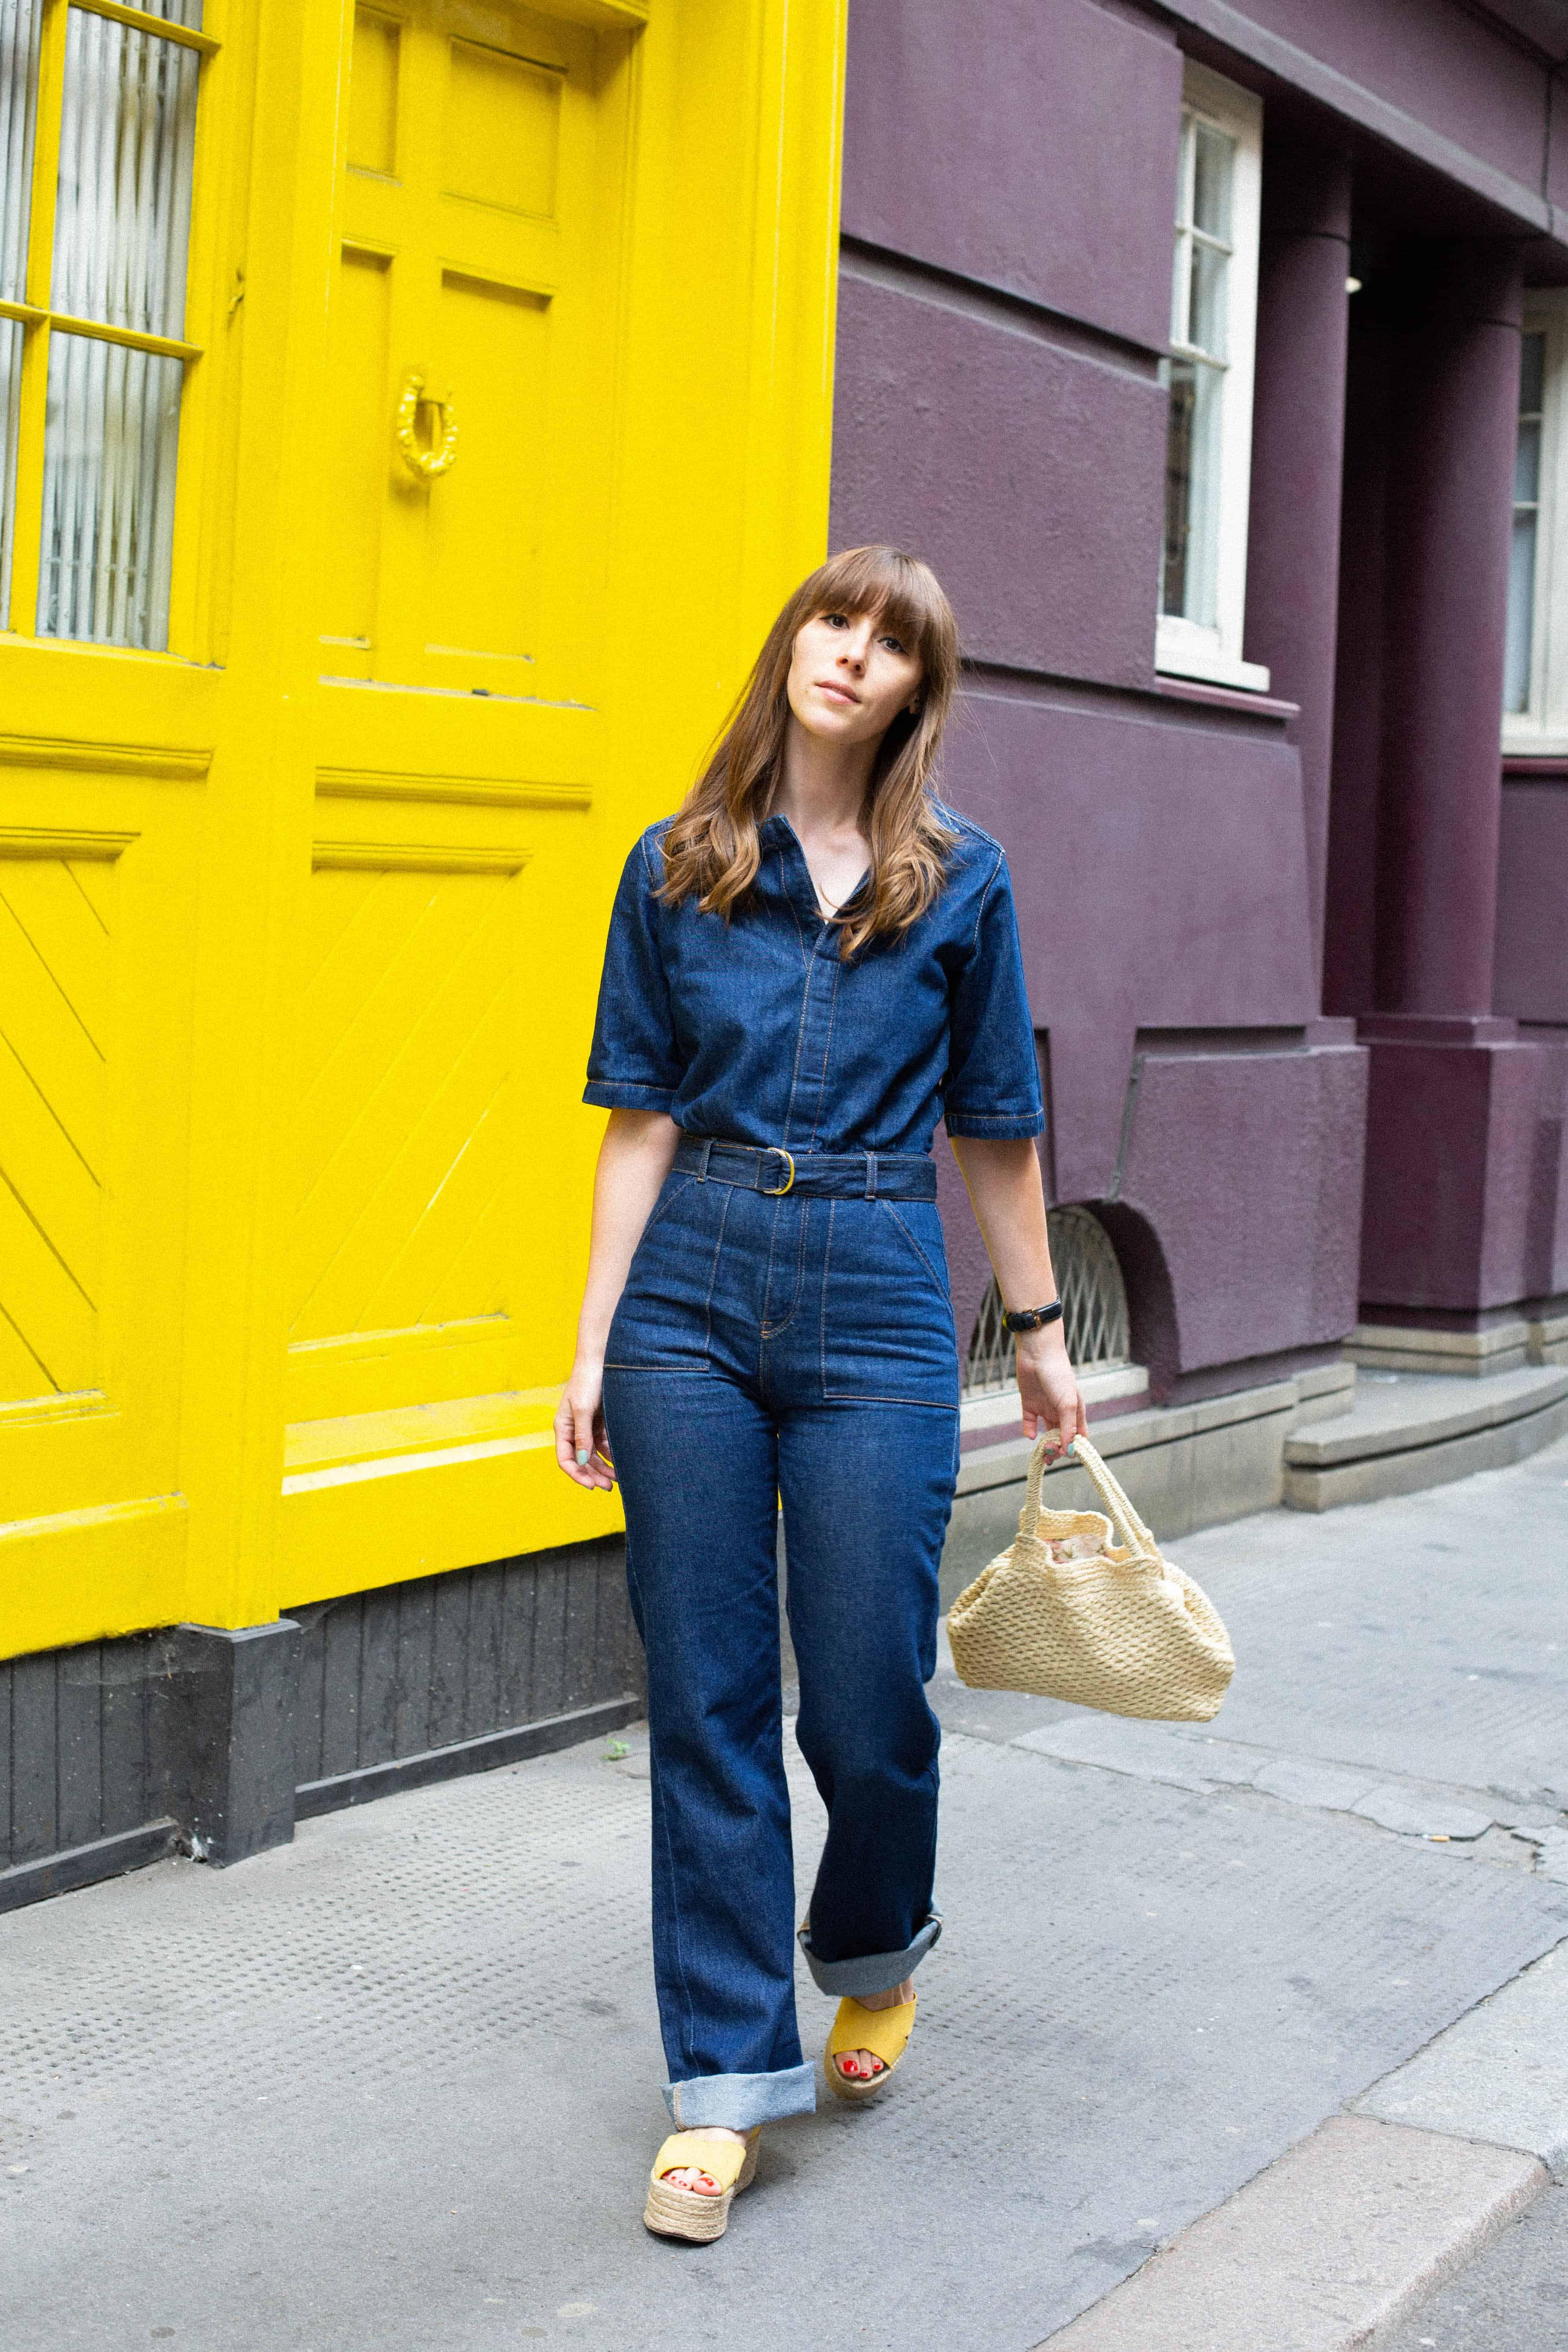 new items get new quality design 70s style denim jumpsuit - Fashion Et Moi